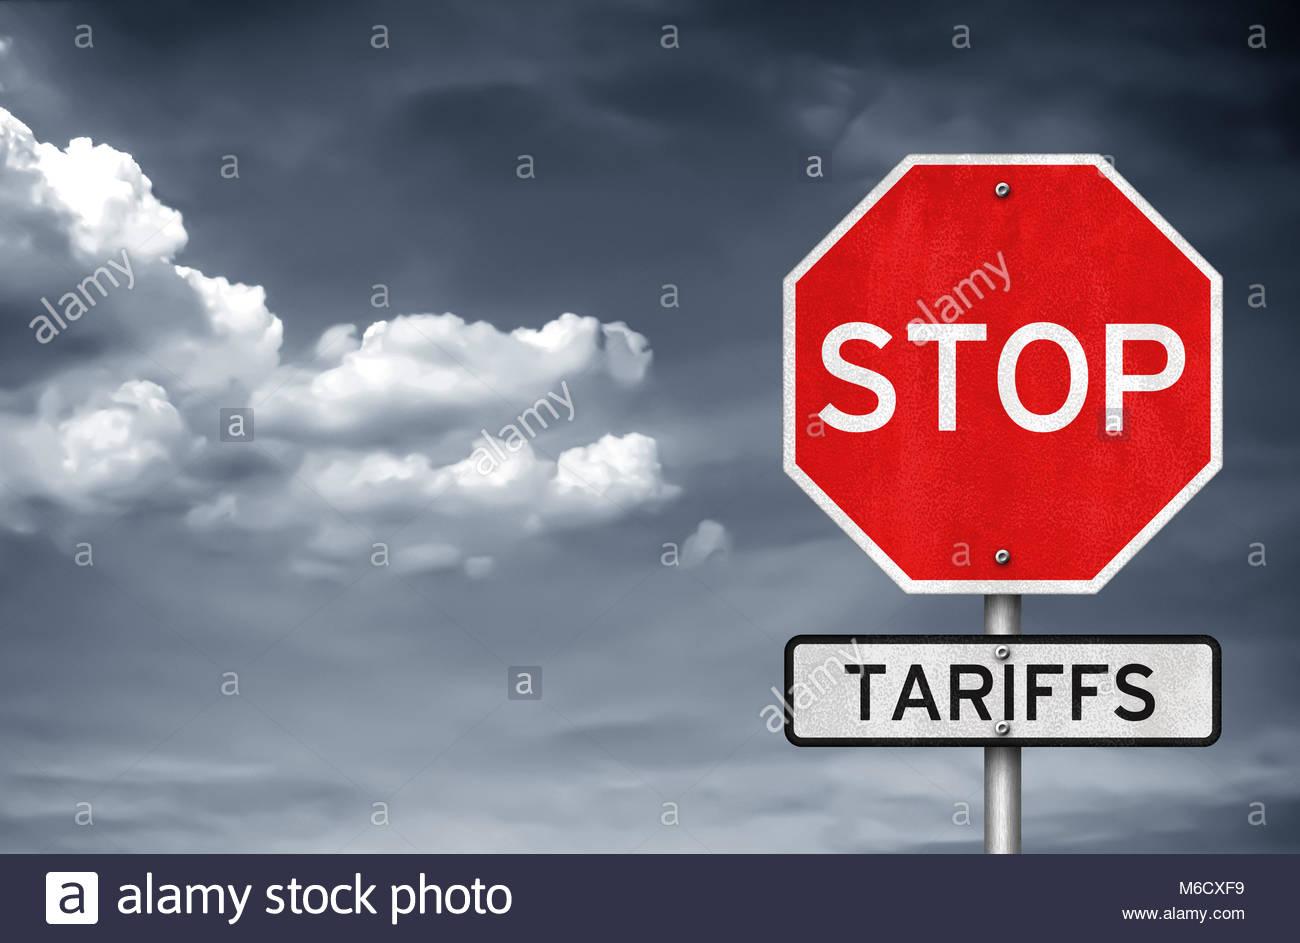 Stop Tariffs - Stock Image